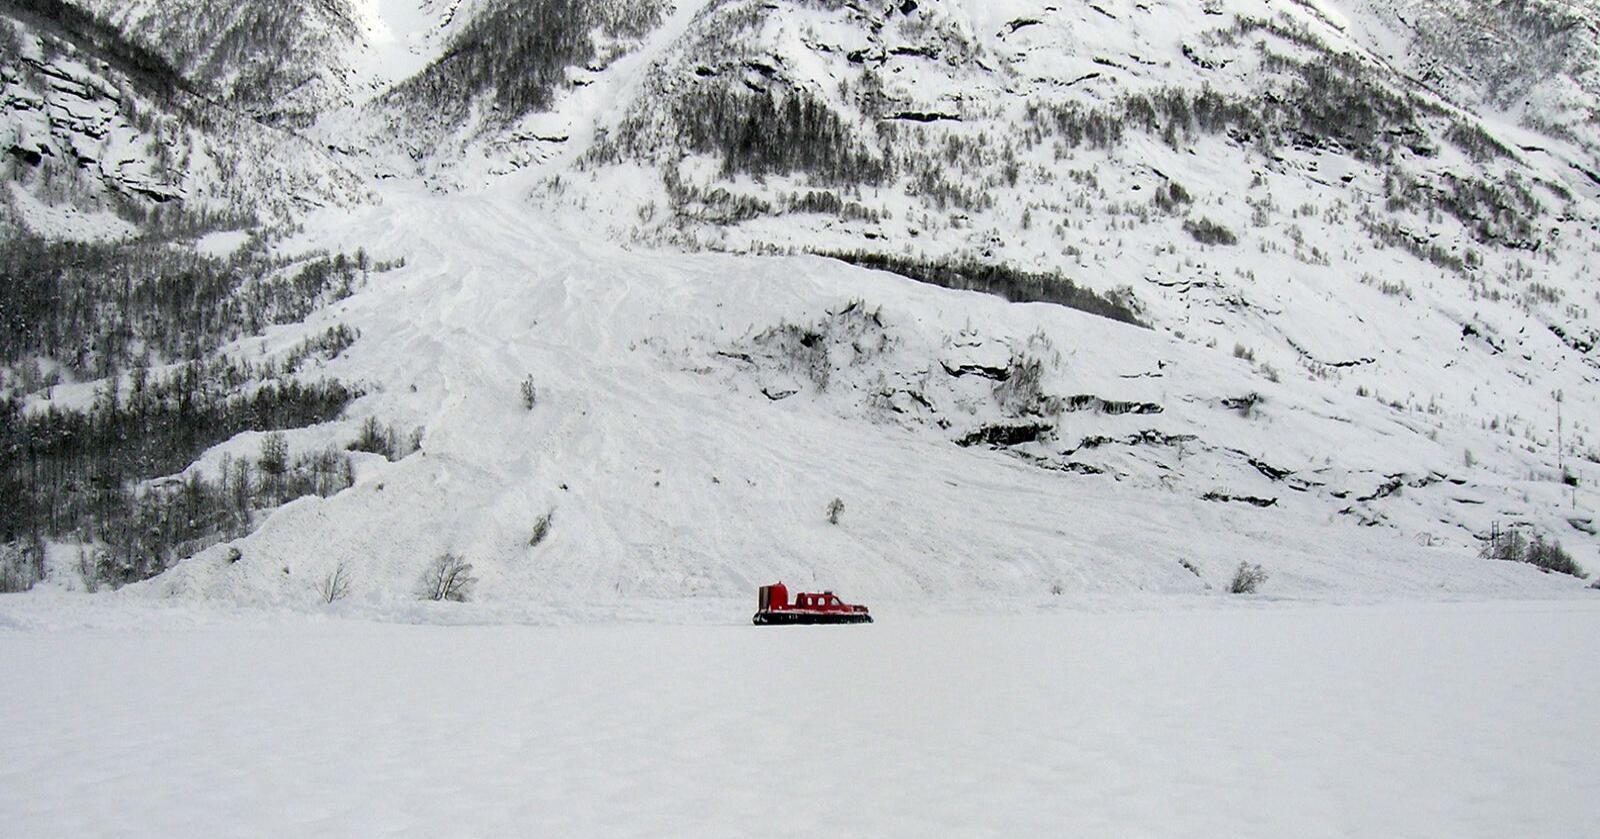 Et snøskred har rammet bygda Veitastrond i Luster i Sogn og Fjordane. Dette bildet er fra snøraset som rammet bygda i 2011. Foto: John Molland / Scanpix